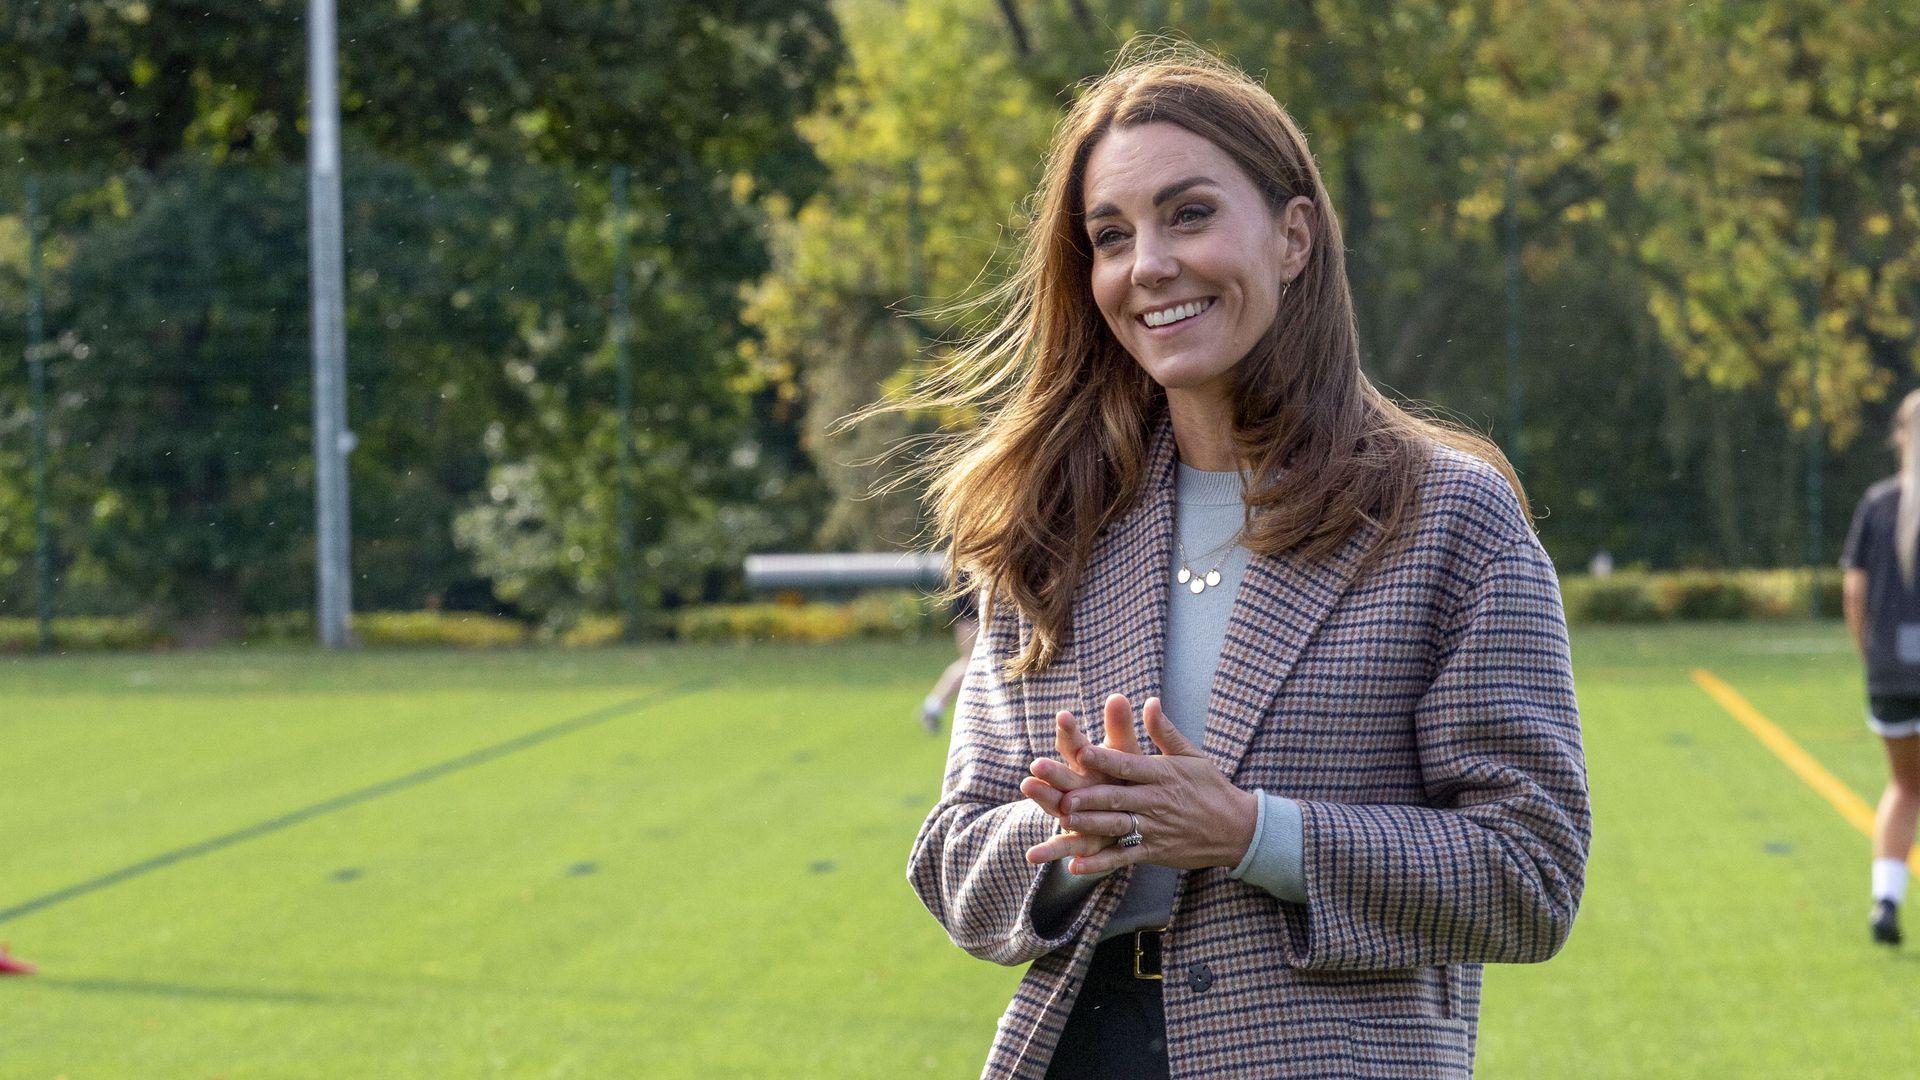 Mode-Queen-Herzogin-Kate-ist-die-stylishste-Royal-Lady